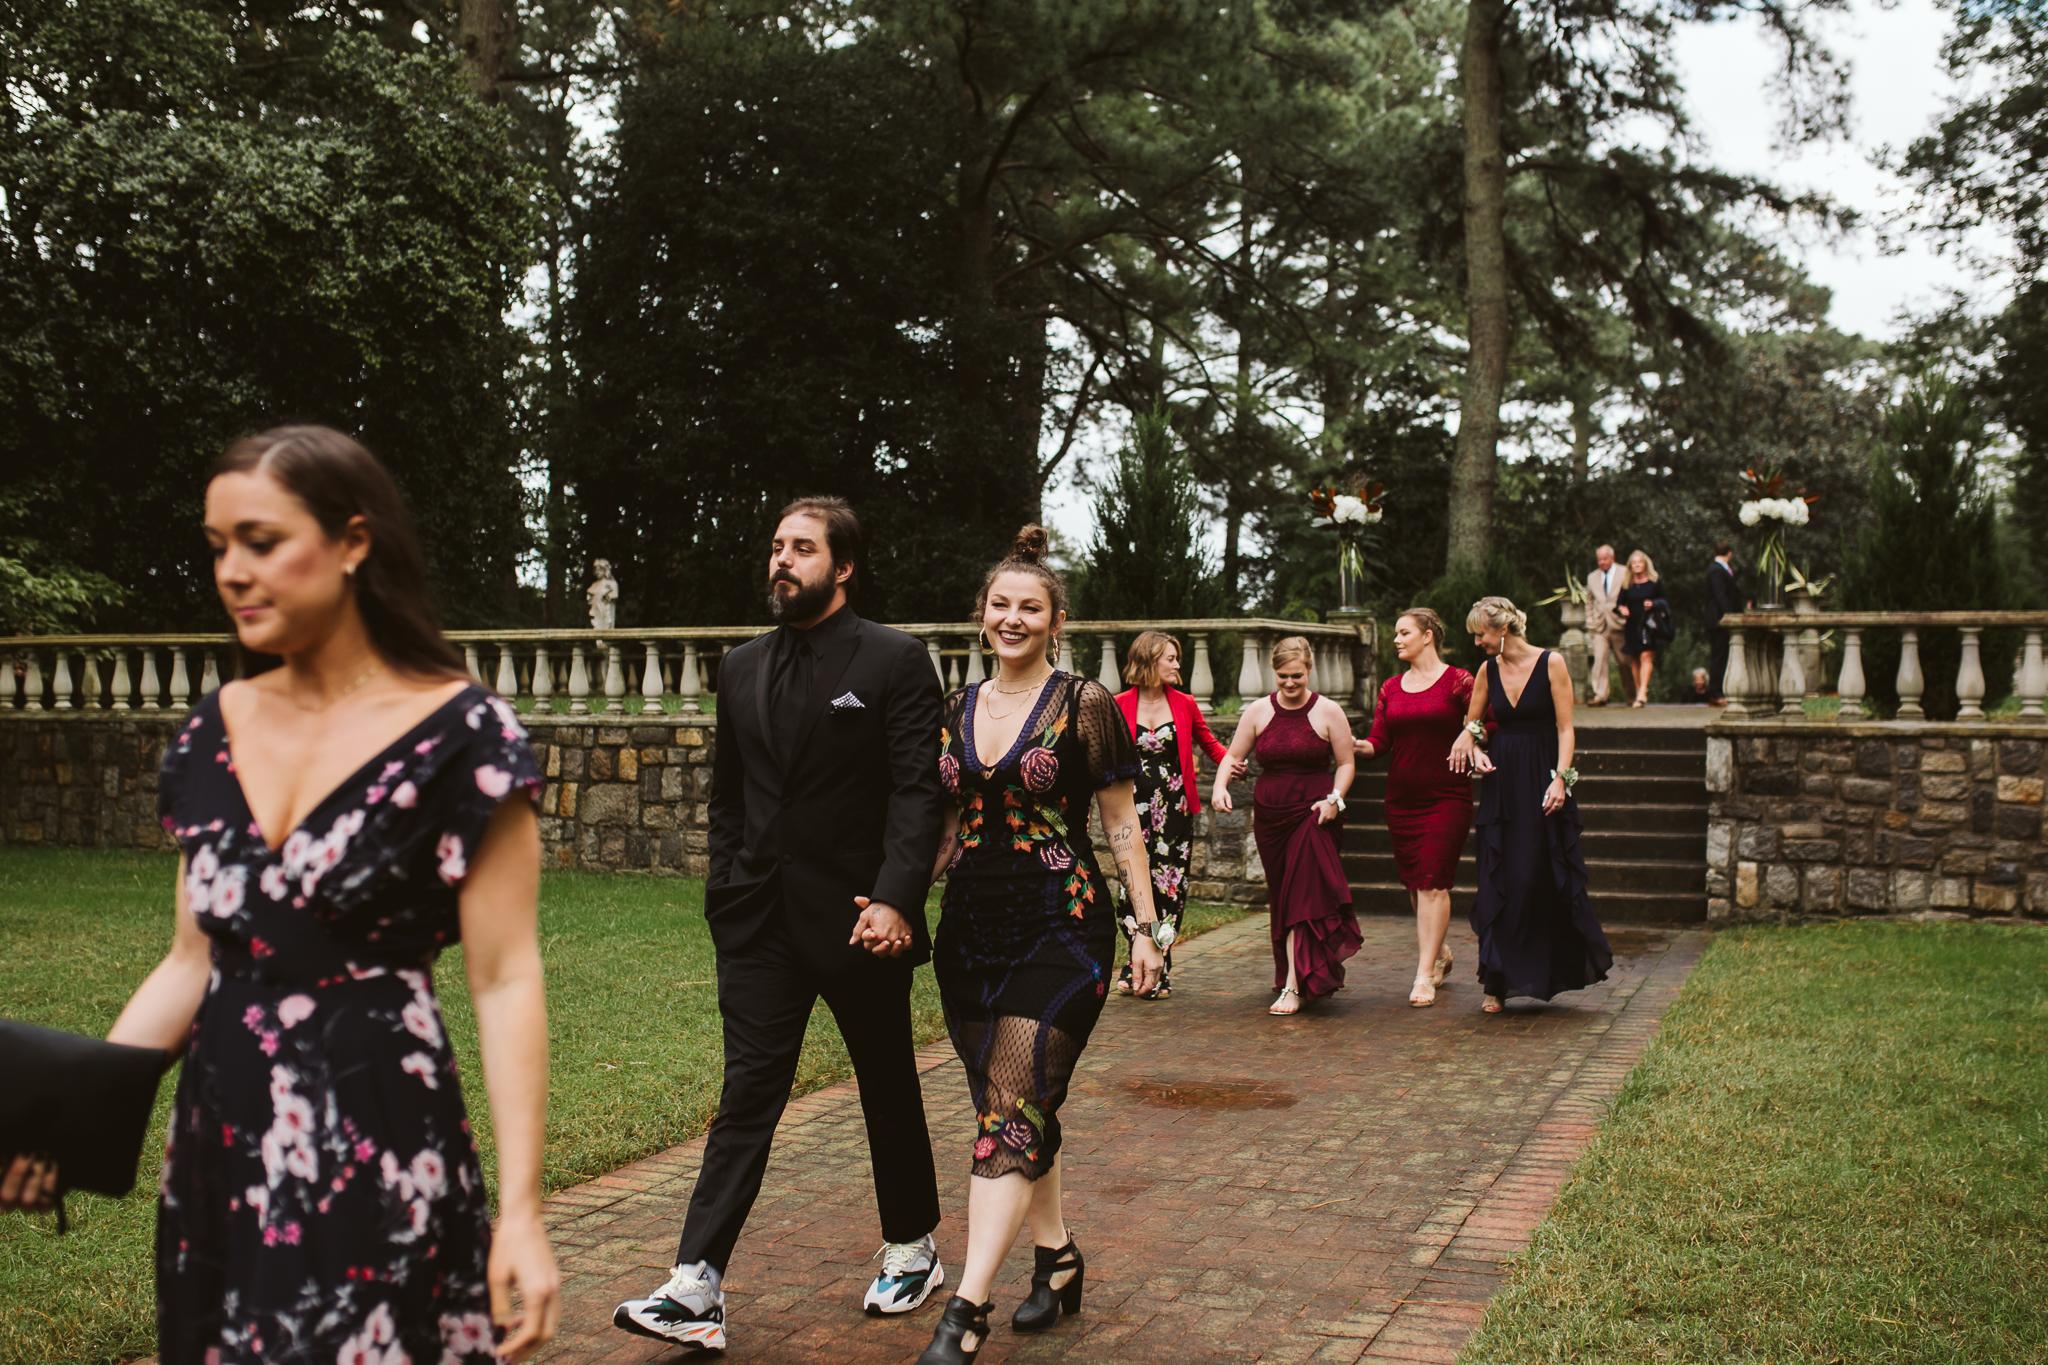 hamptonroads_wedding_norfolk_botanical_gardens-35.JPG